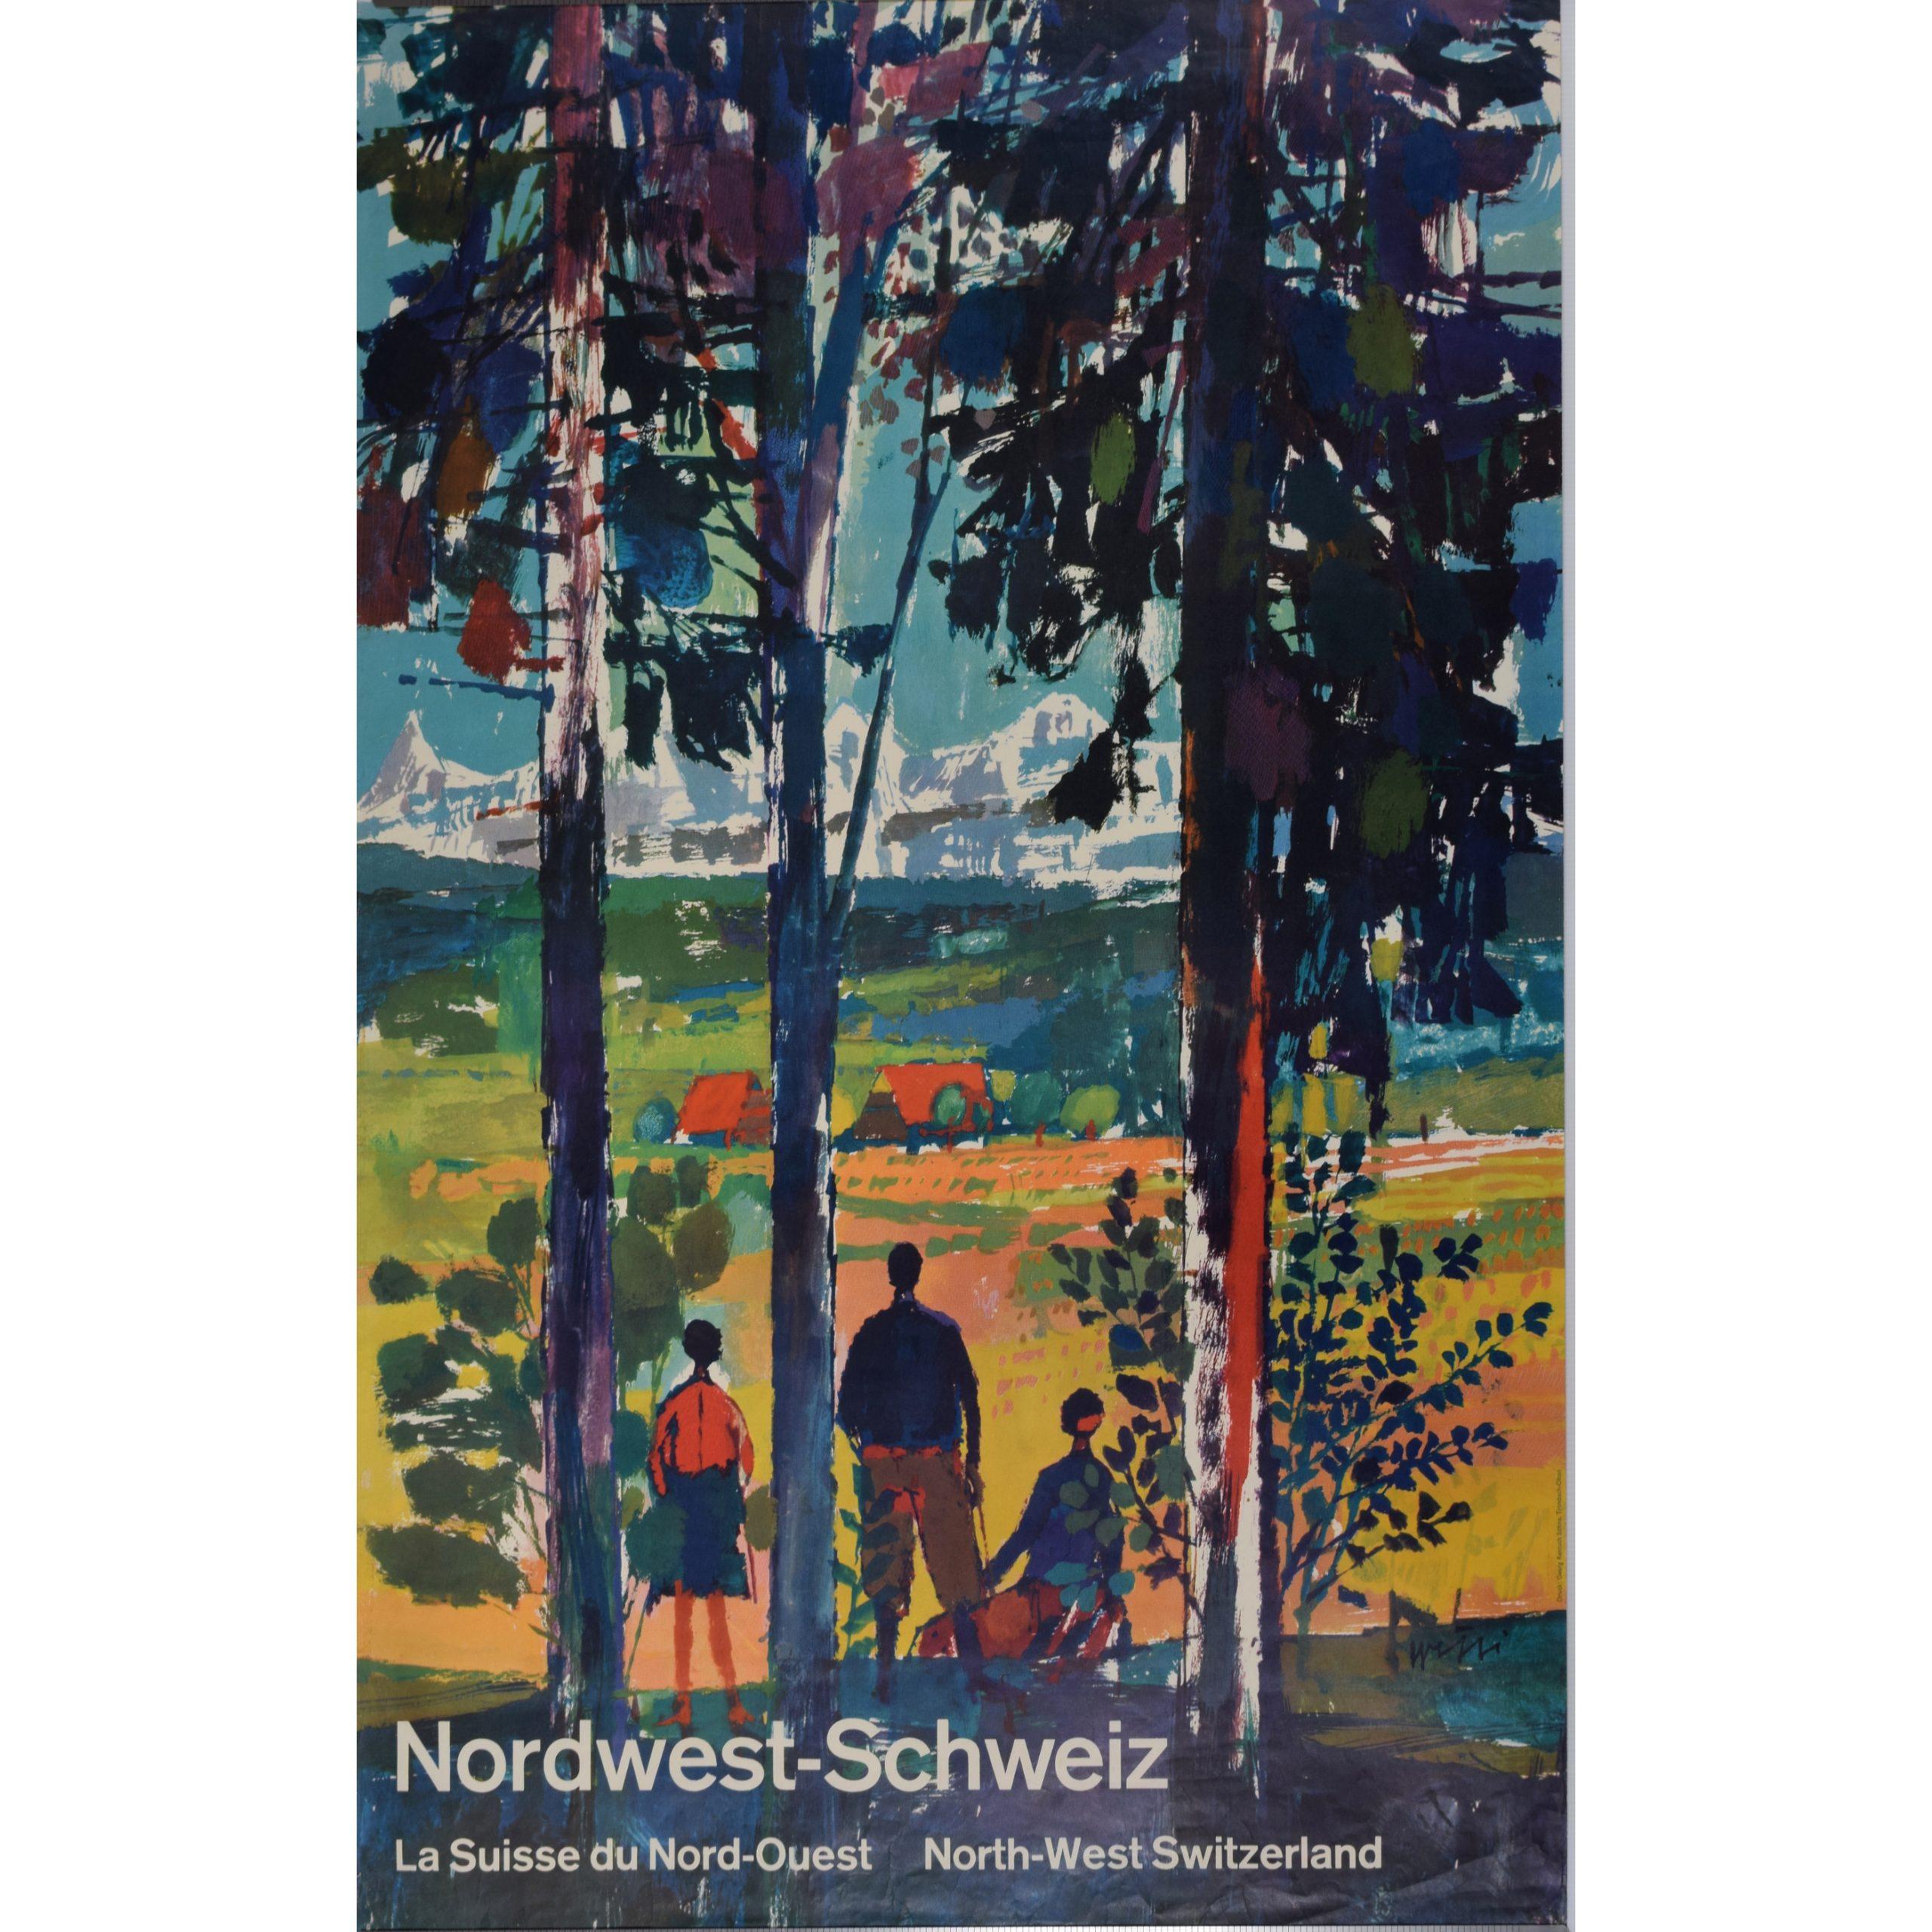 Hugo Wetli: Nordwest-Schweiz North-West Switzerland Skiing